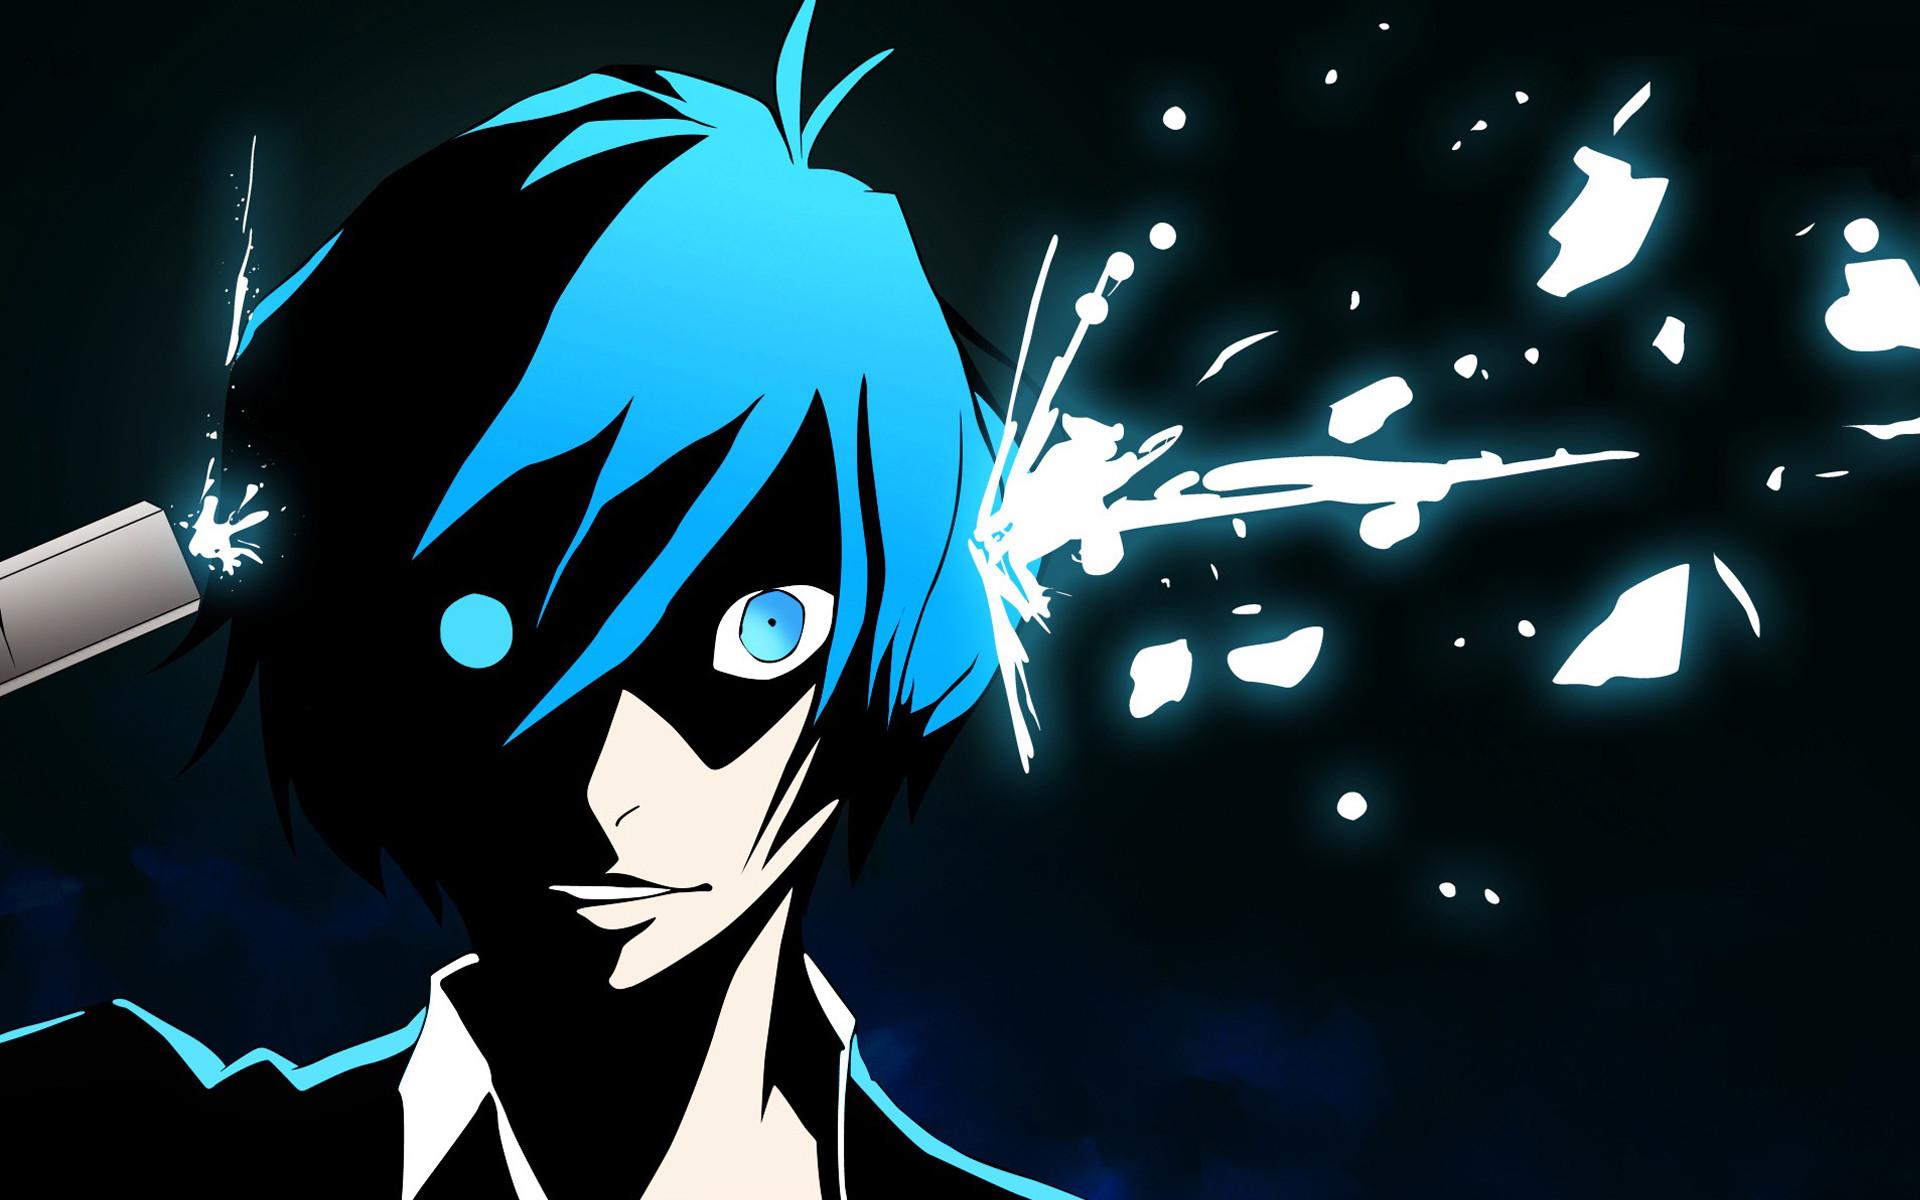 Dark Anime Wallpaper Hd  Images